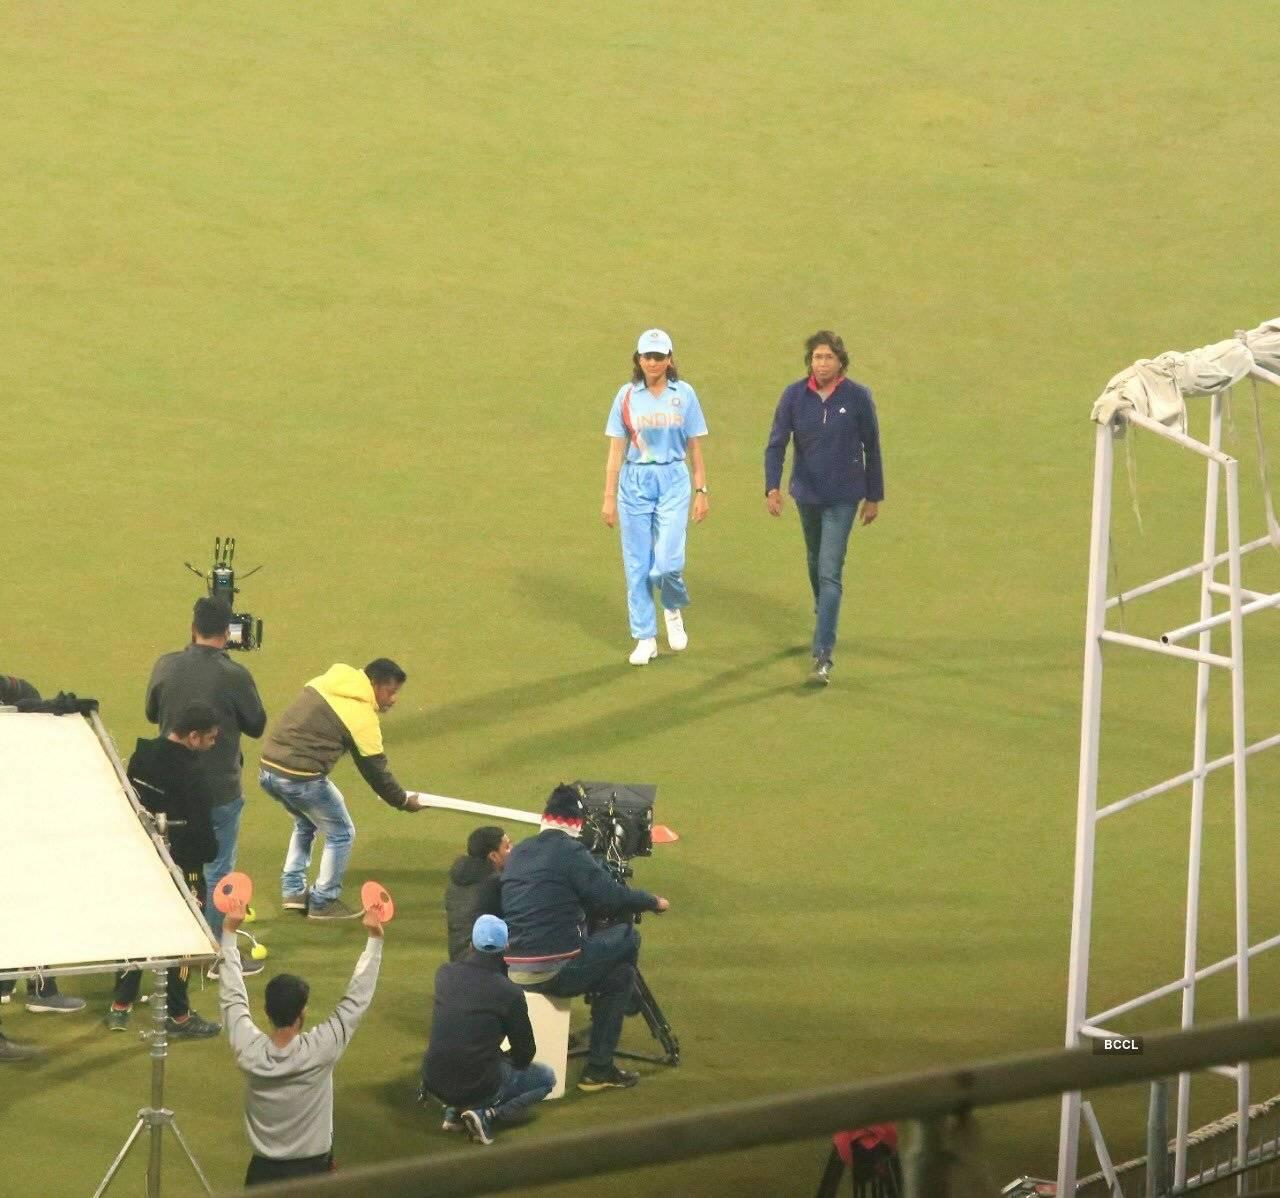 Anushka Sharma to portray former cricketer Jhulan Goswami in upcoming biopic